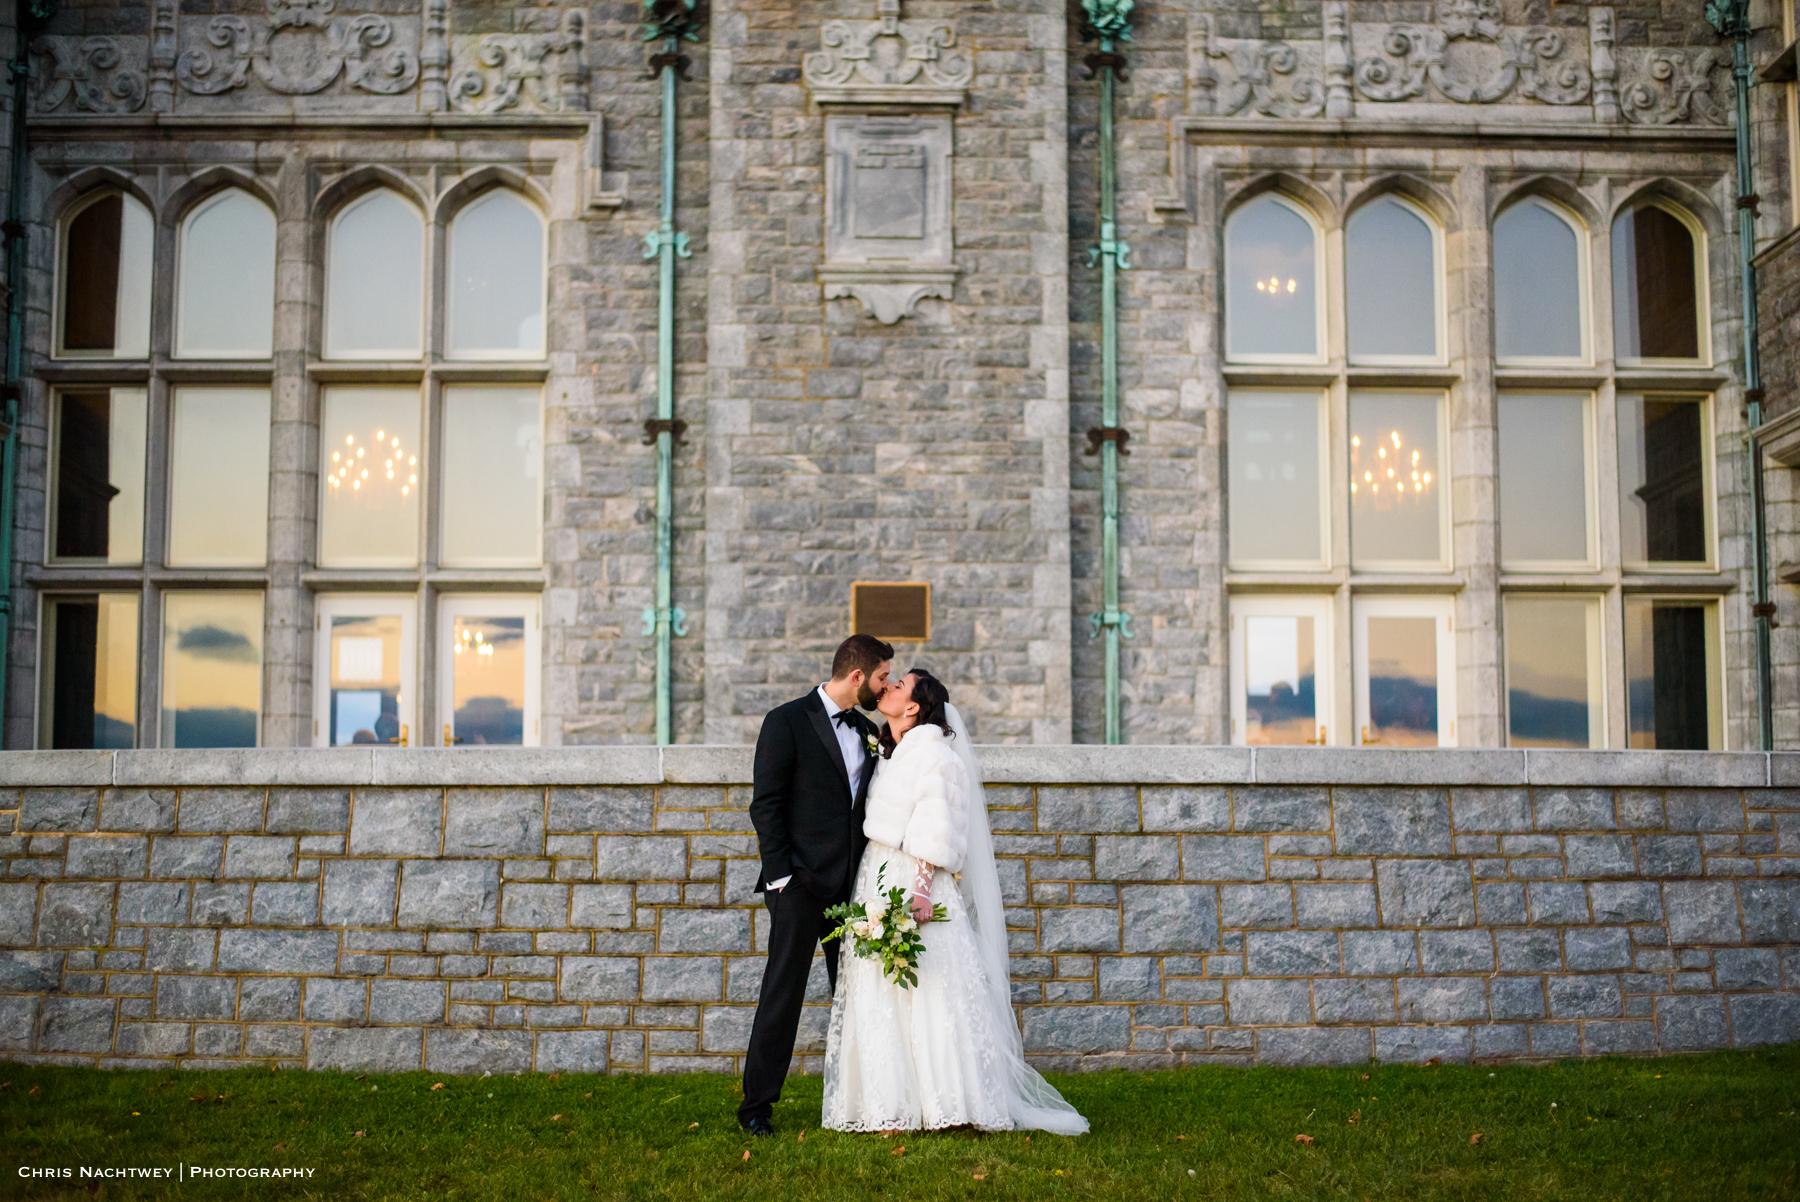 winter-branford-house-wedding-photos-groton-ct-chris-nachtwey-photography-2019-30.jpg